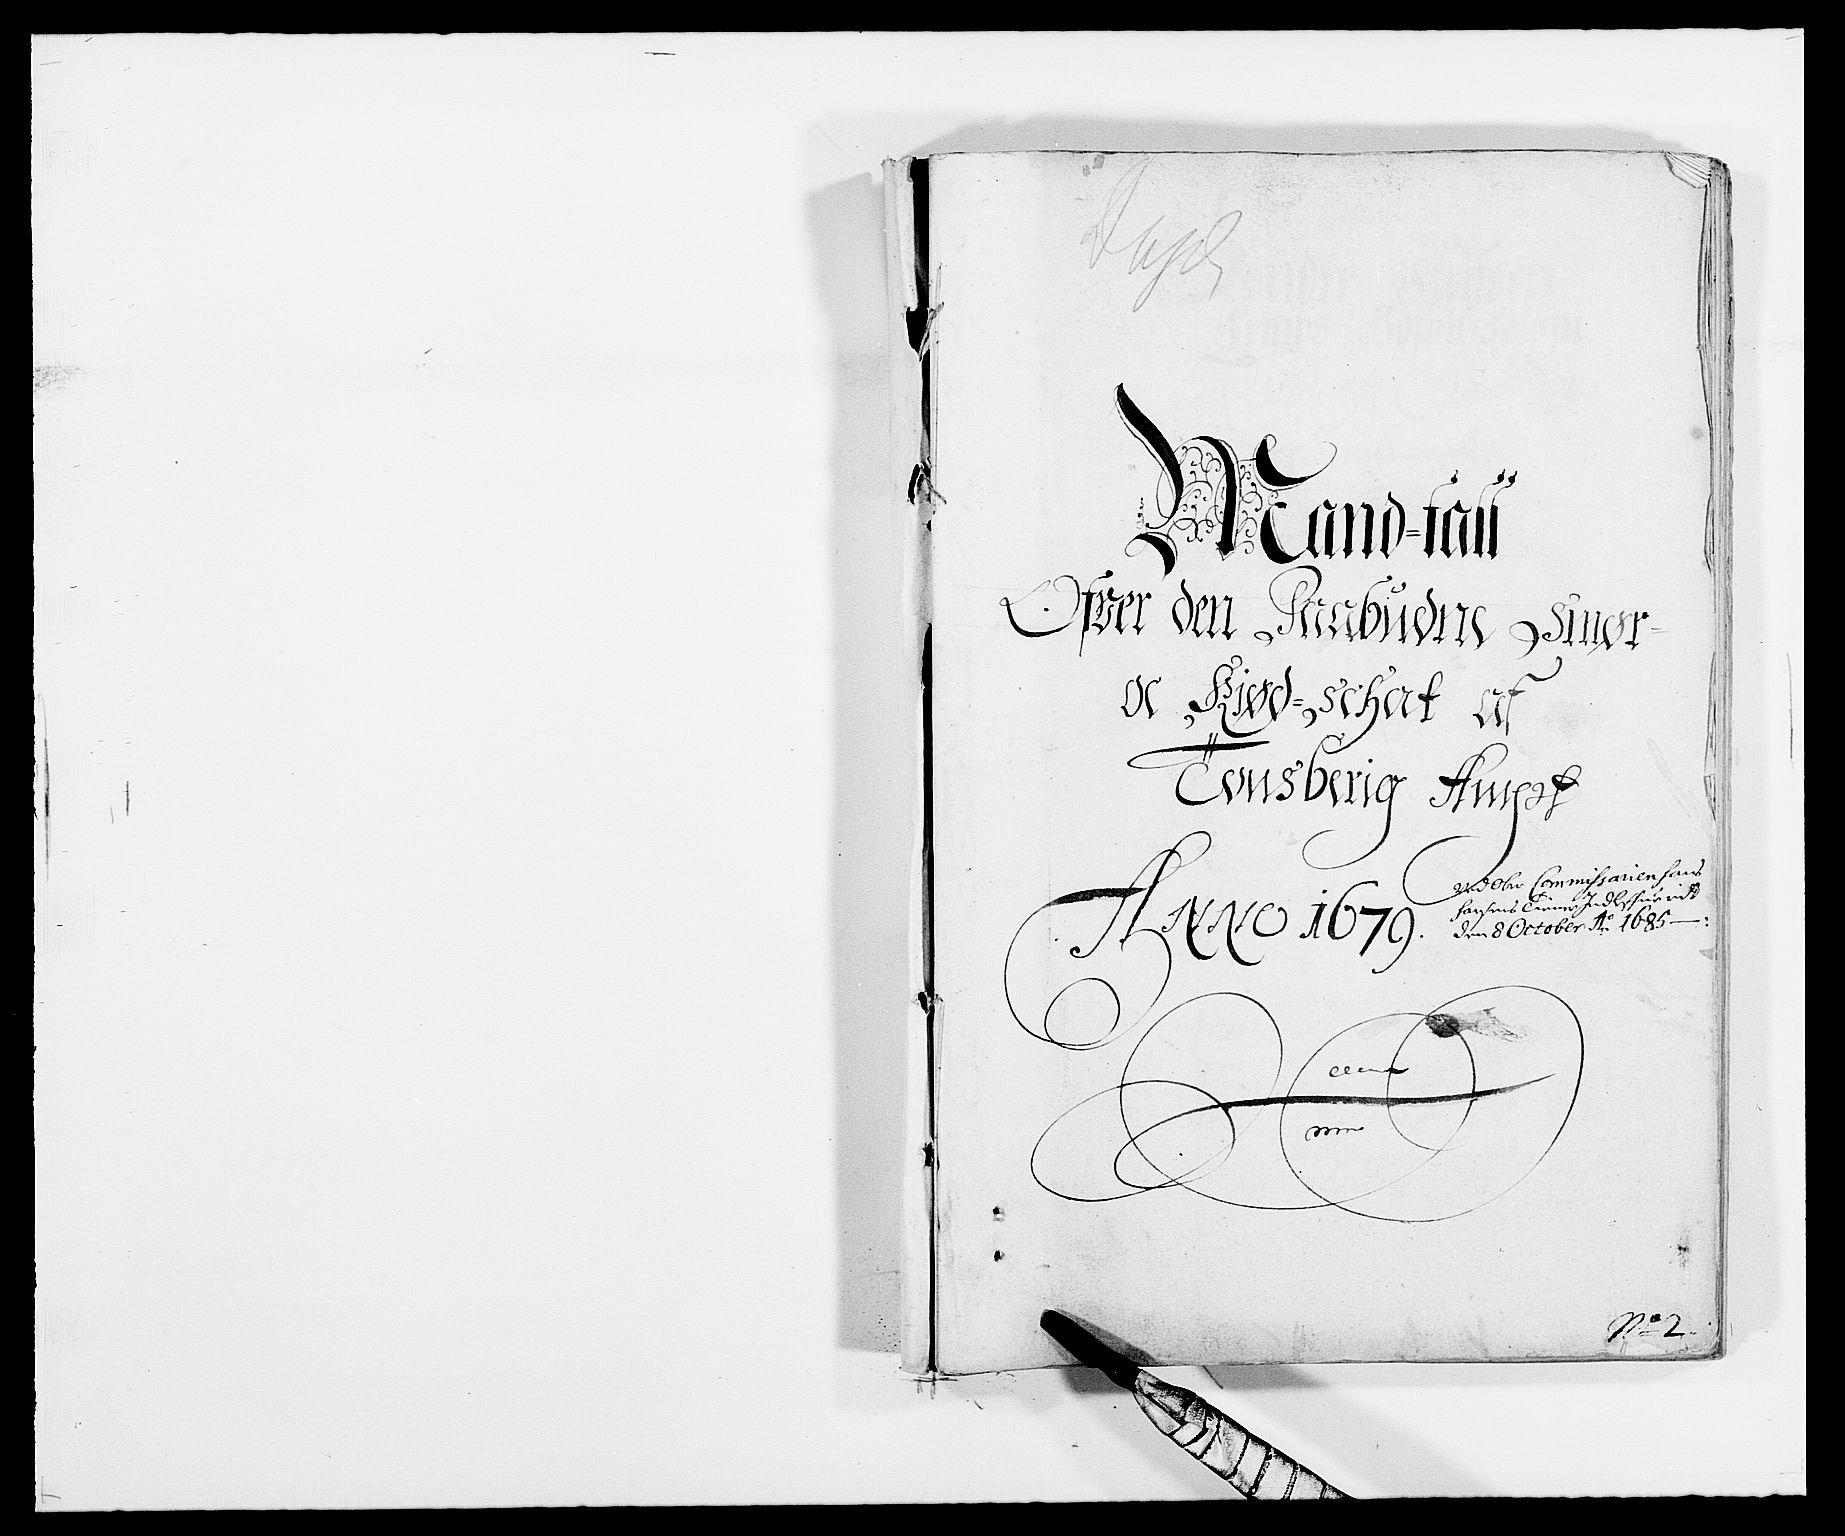 RA, Rentekammeret inntil 1814, Reviderte regnskaper, Fogderegnskap, R32/L1847: Fogderegnskap Jarlsberg grevskap, 1679-1680, s. 112